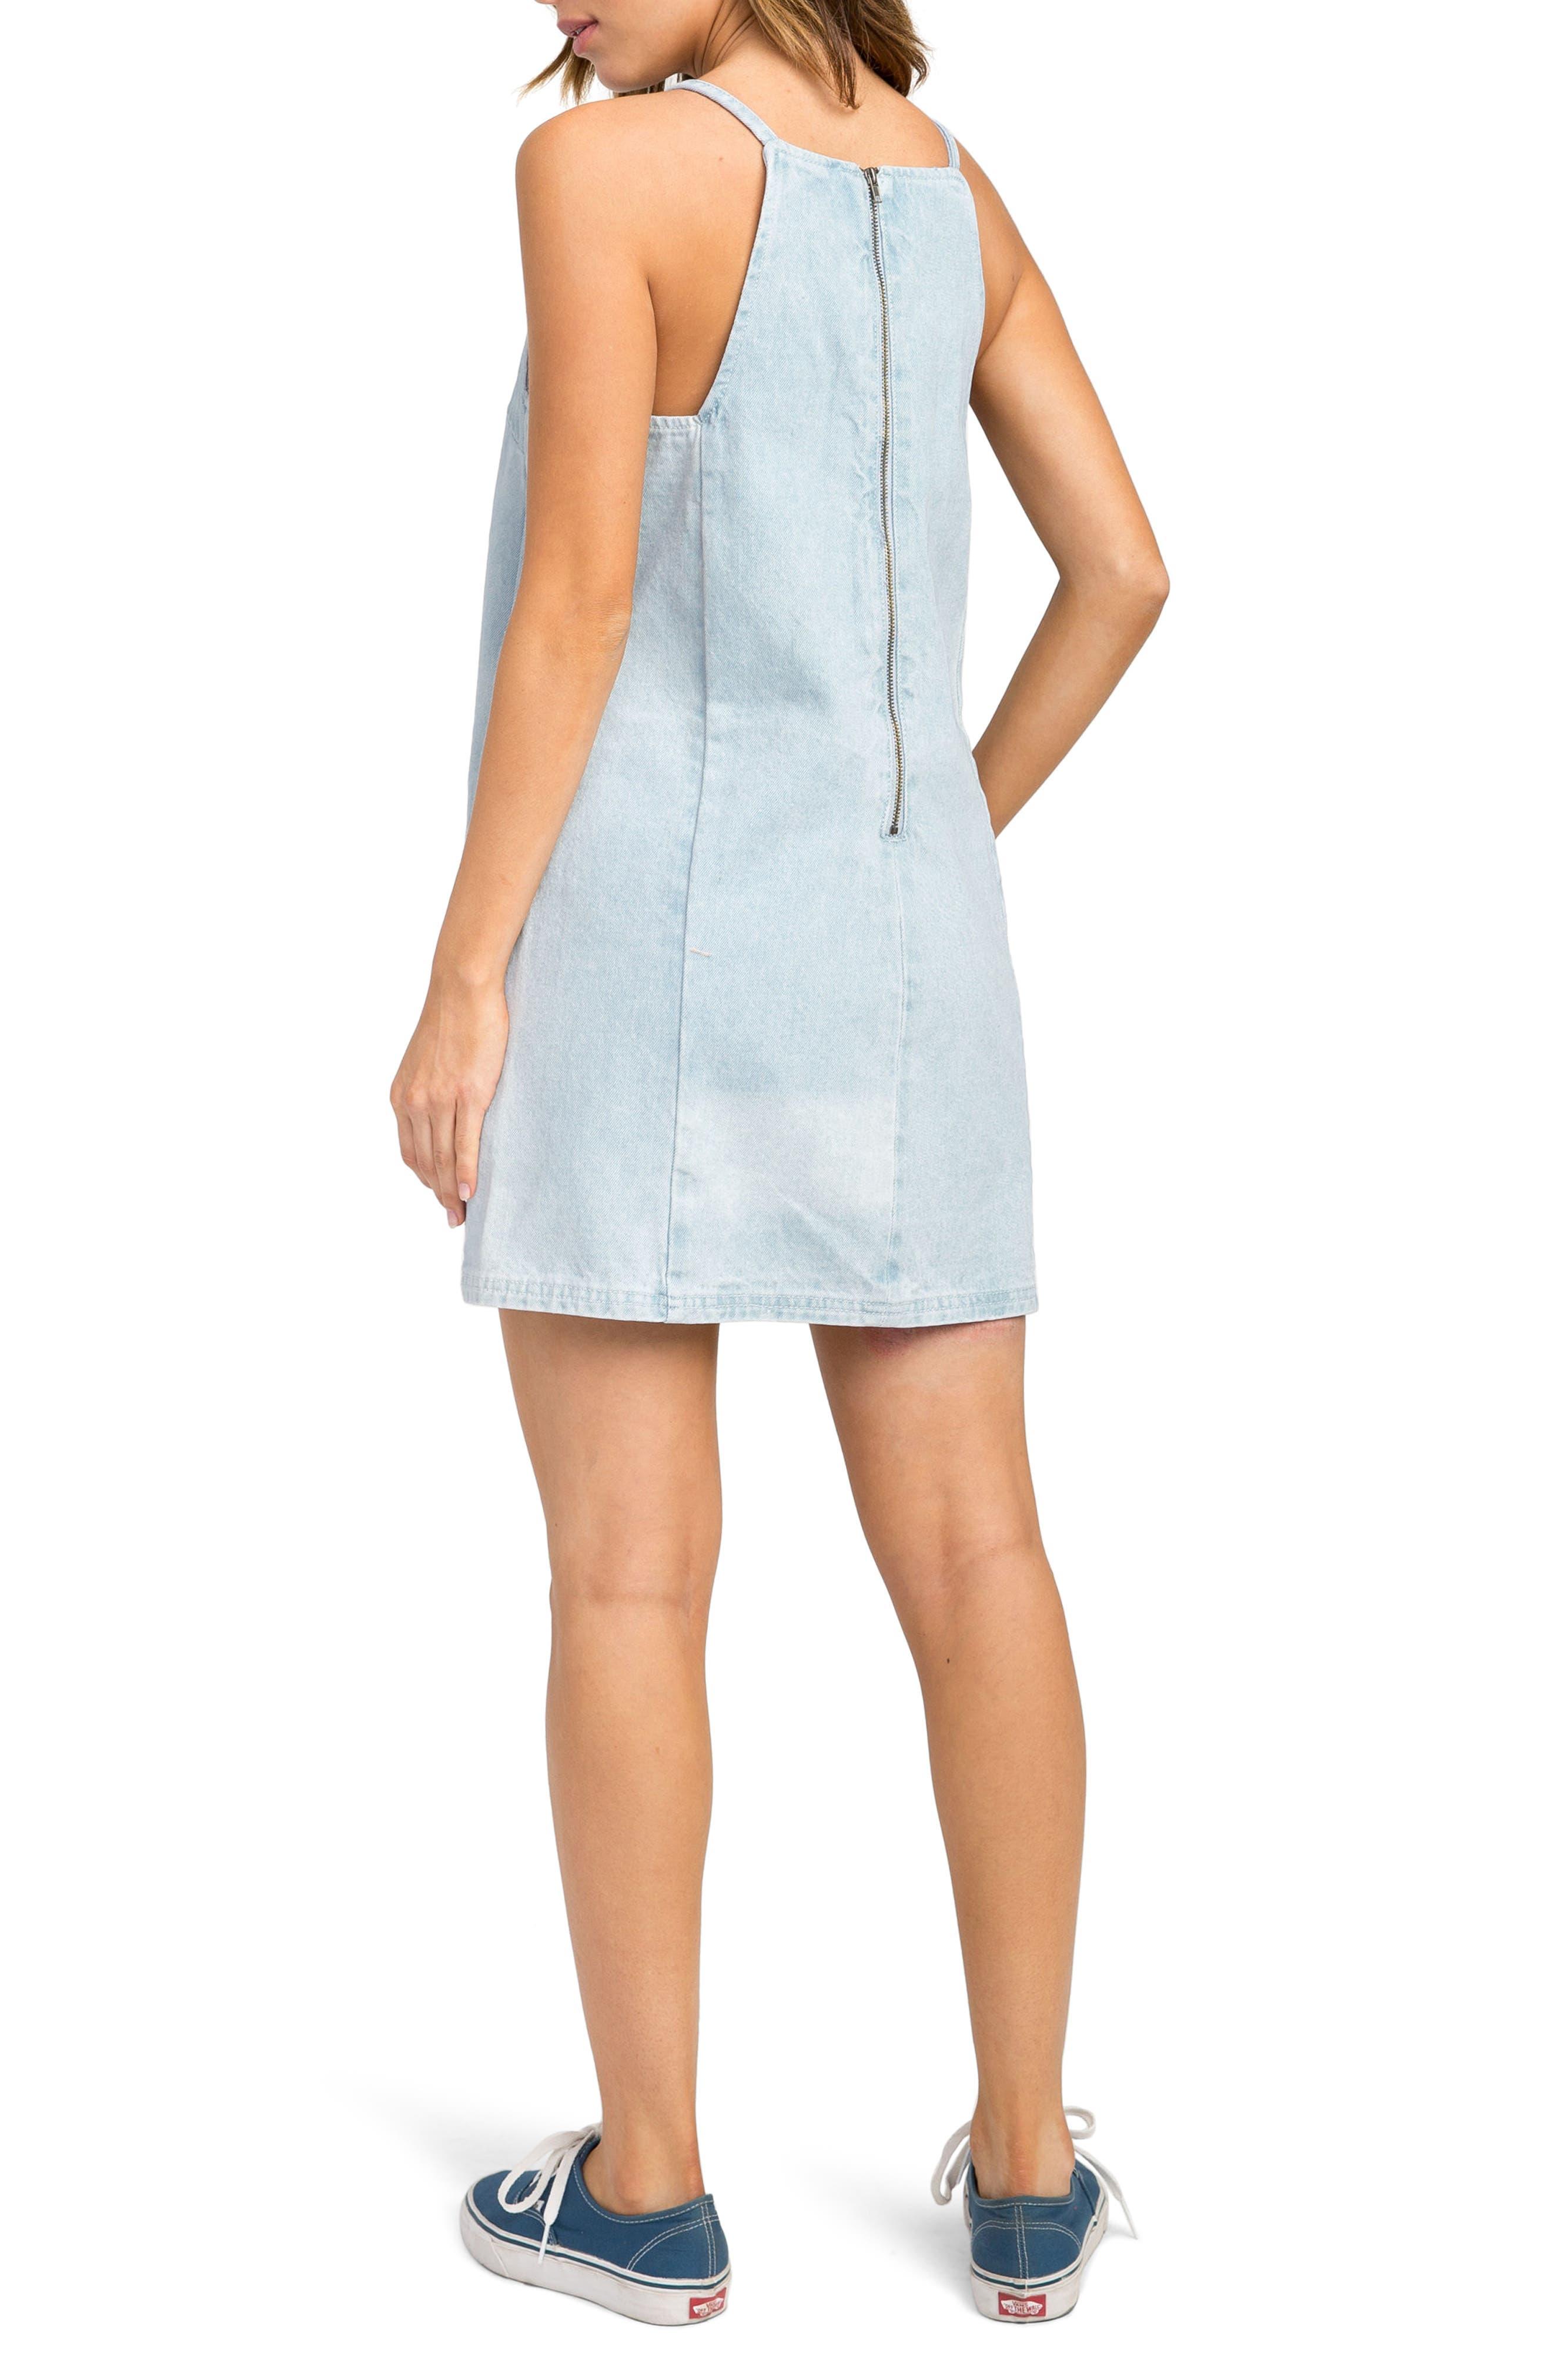 Maple Denim Apron Dress,                             Alternate thumbnail 3, color,                             Denim